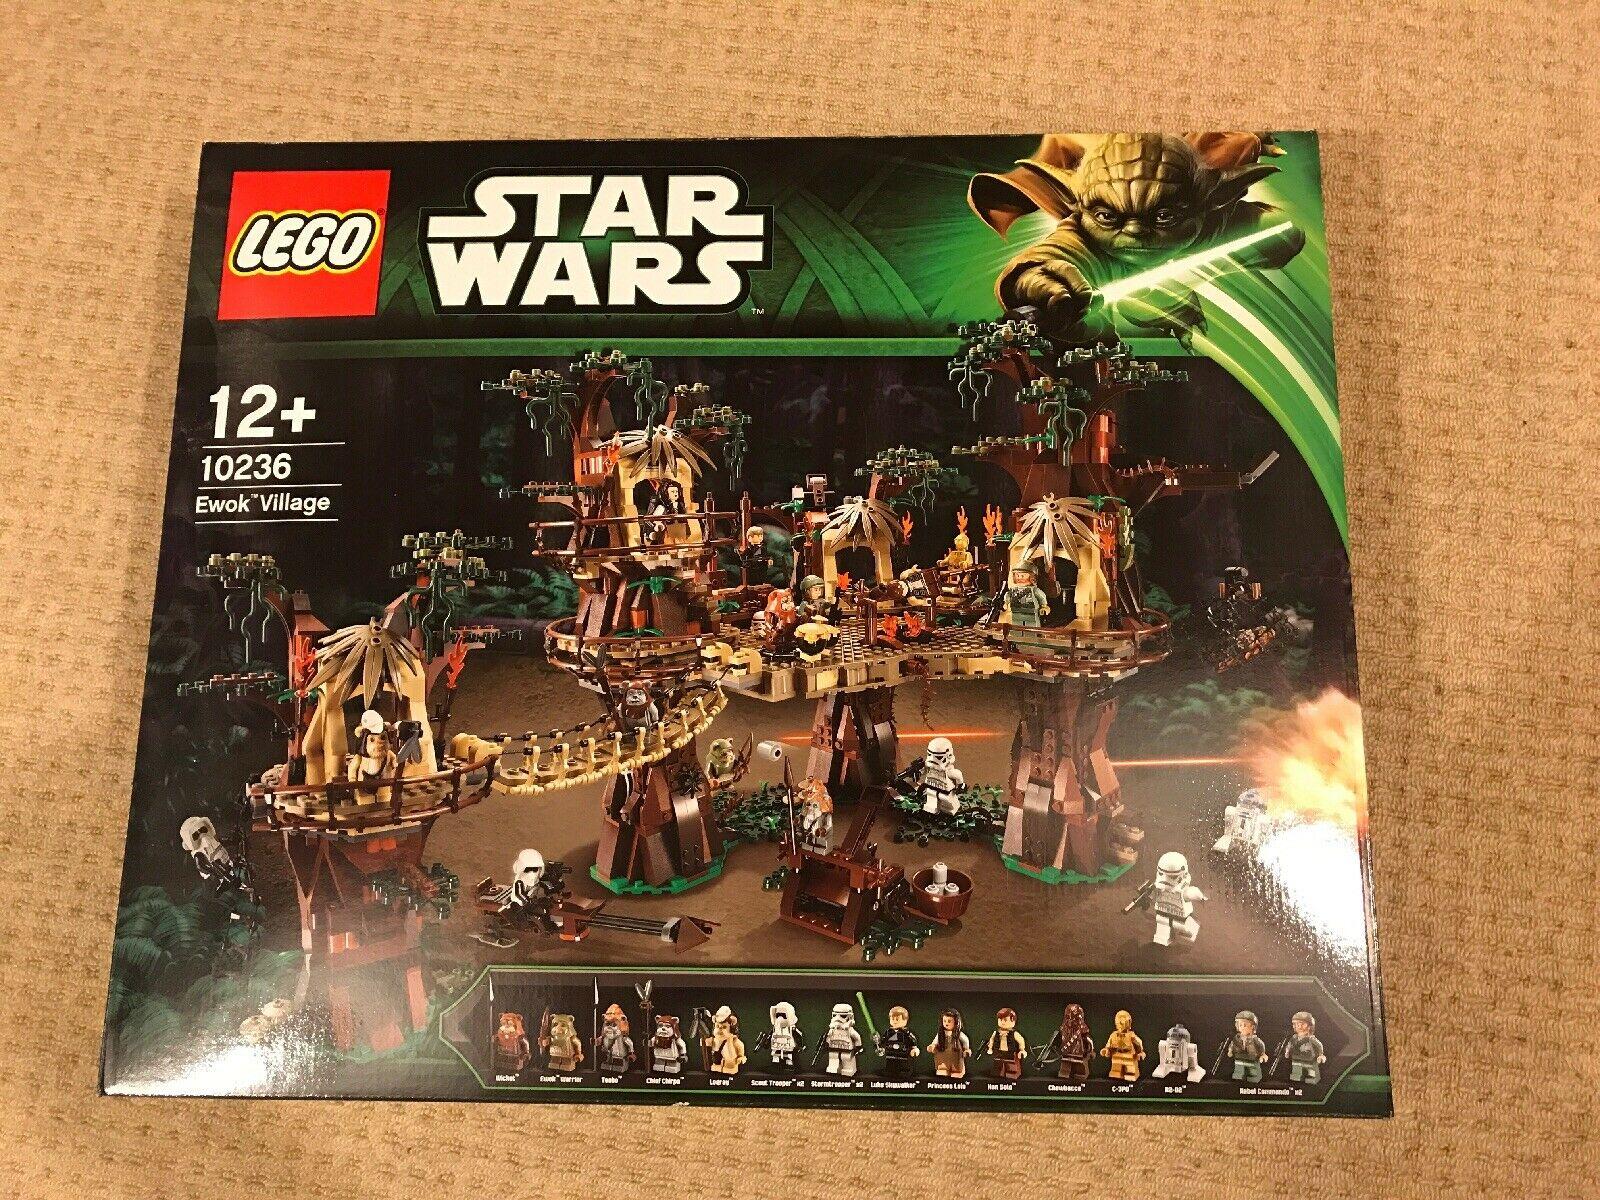 Lego Wars Ewok Village Star Nngvub4181 Lego Complete Lego Star Wars Princess Leia Set 1061599 Hd Wallpaper Backgrounds Download